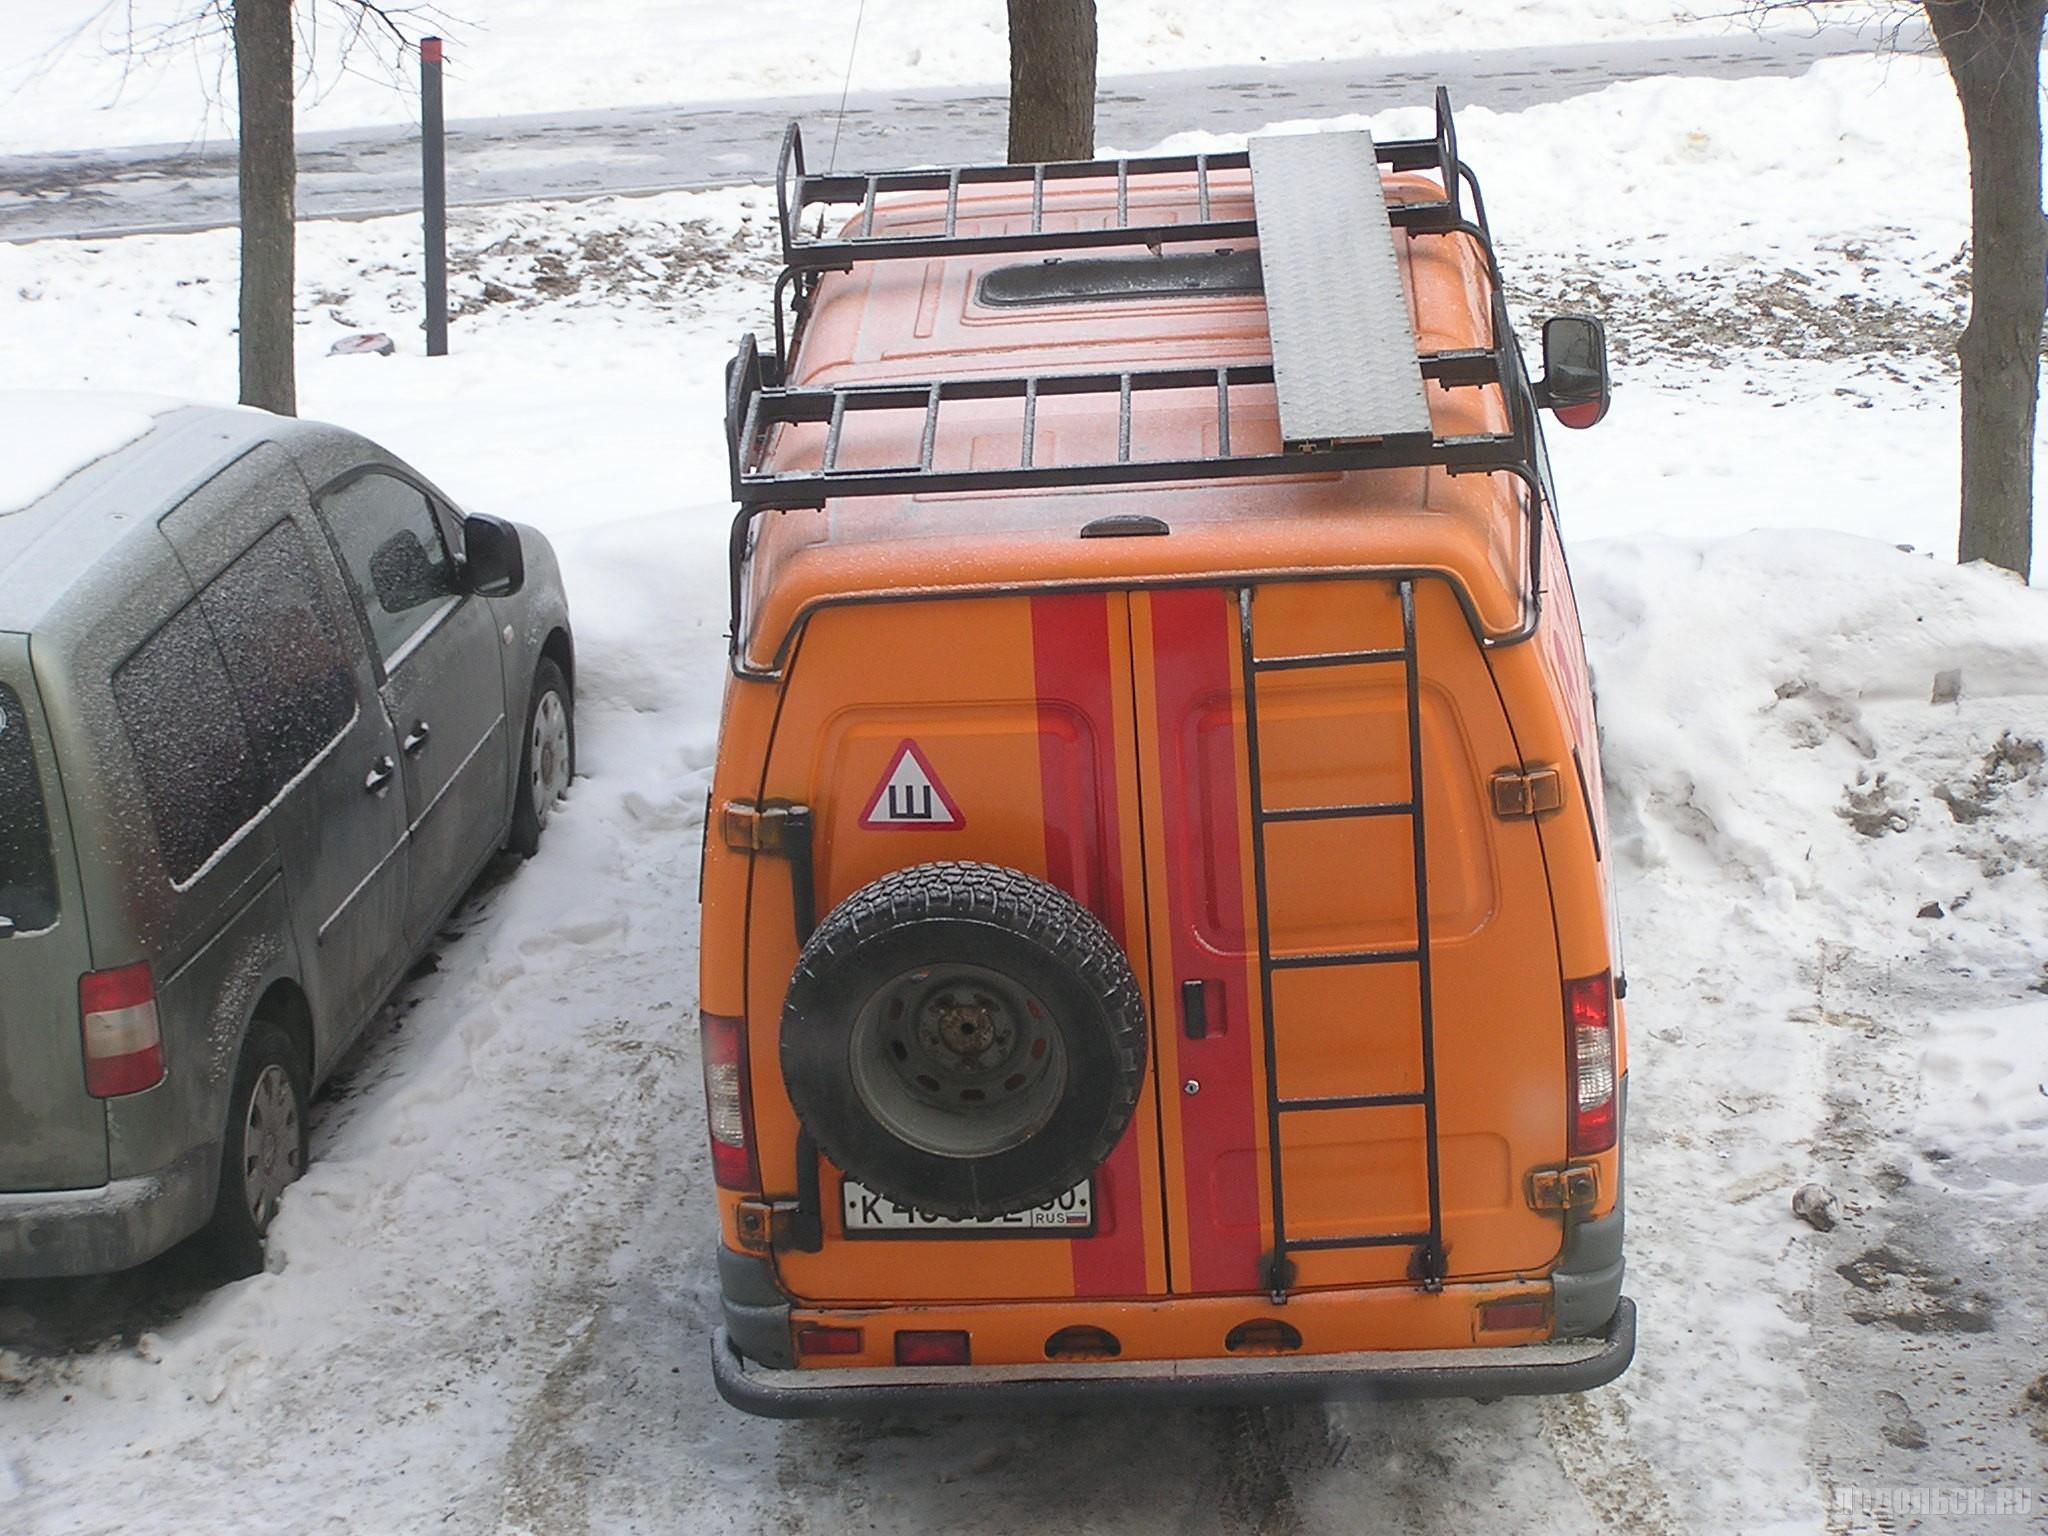 Машина  Мособлгаза. 9 февраля 2017.